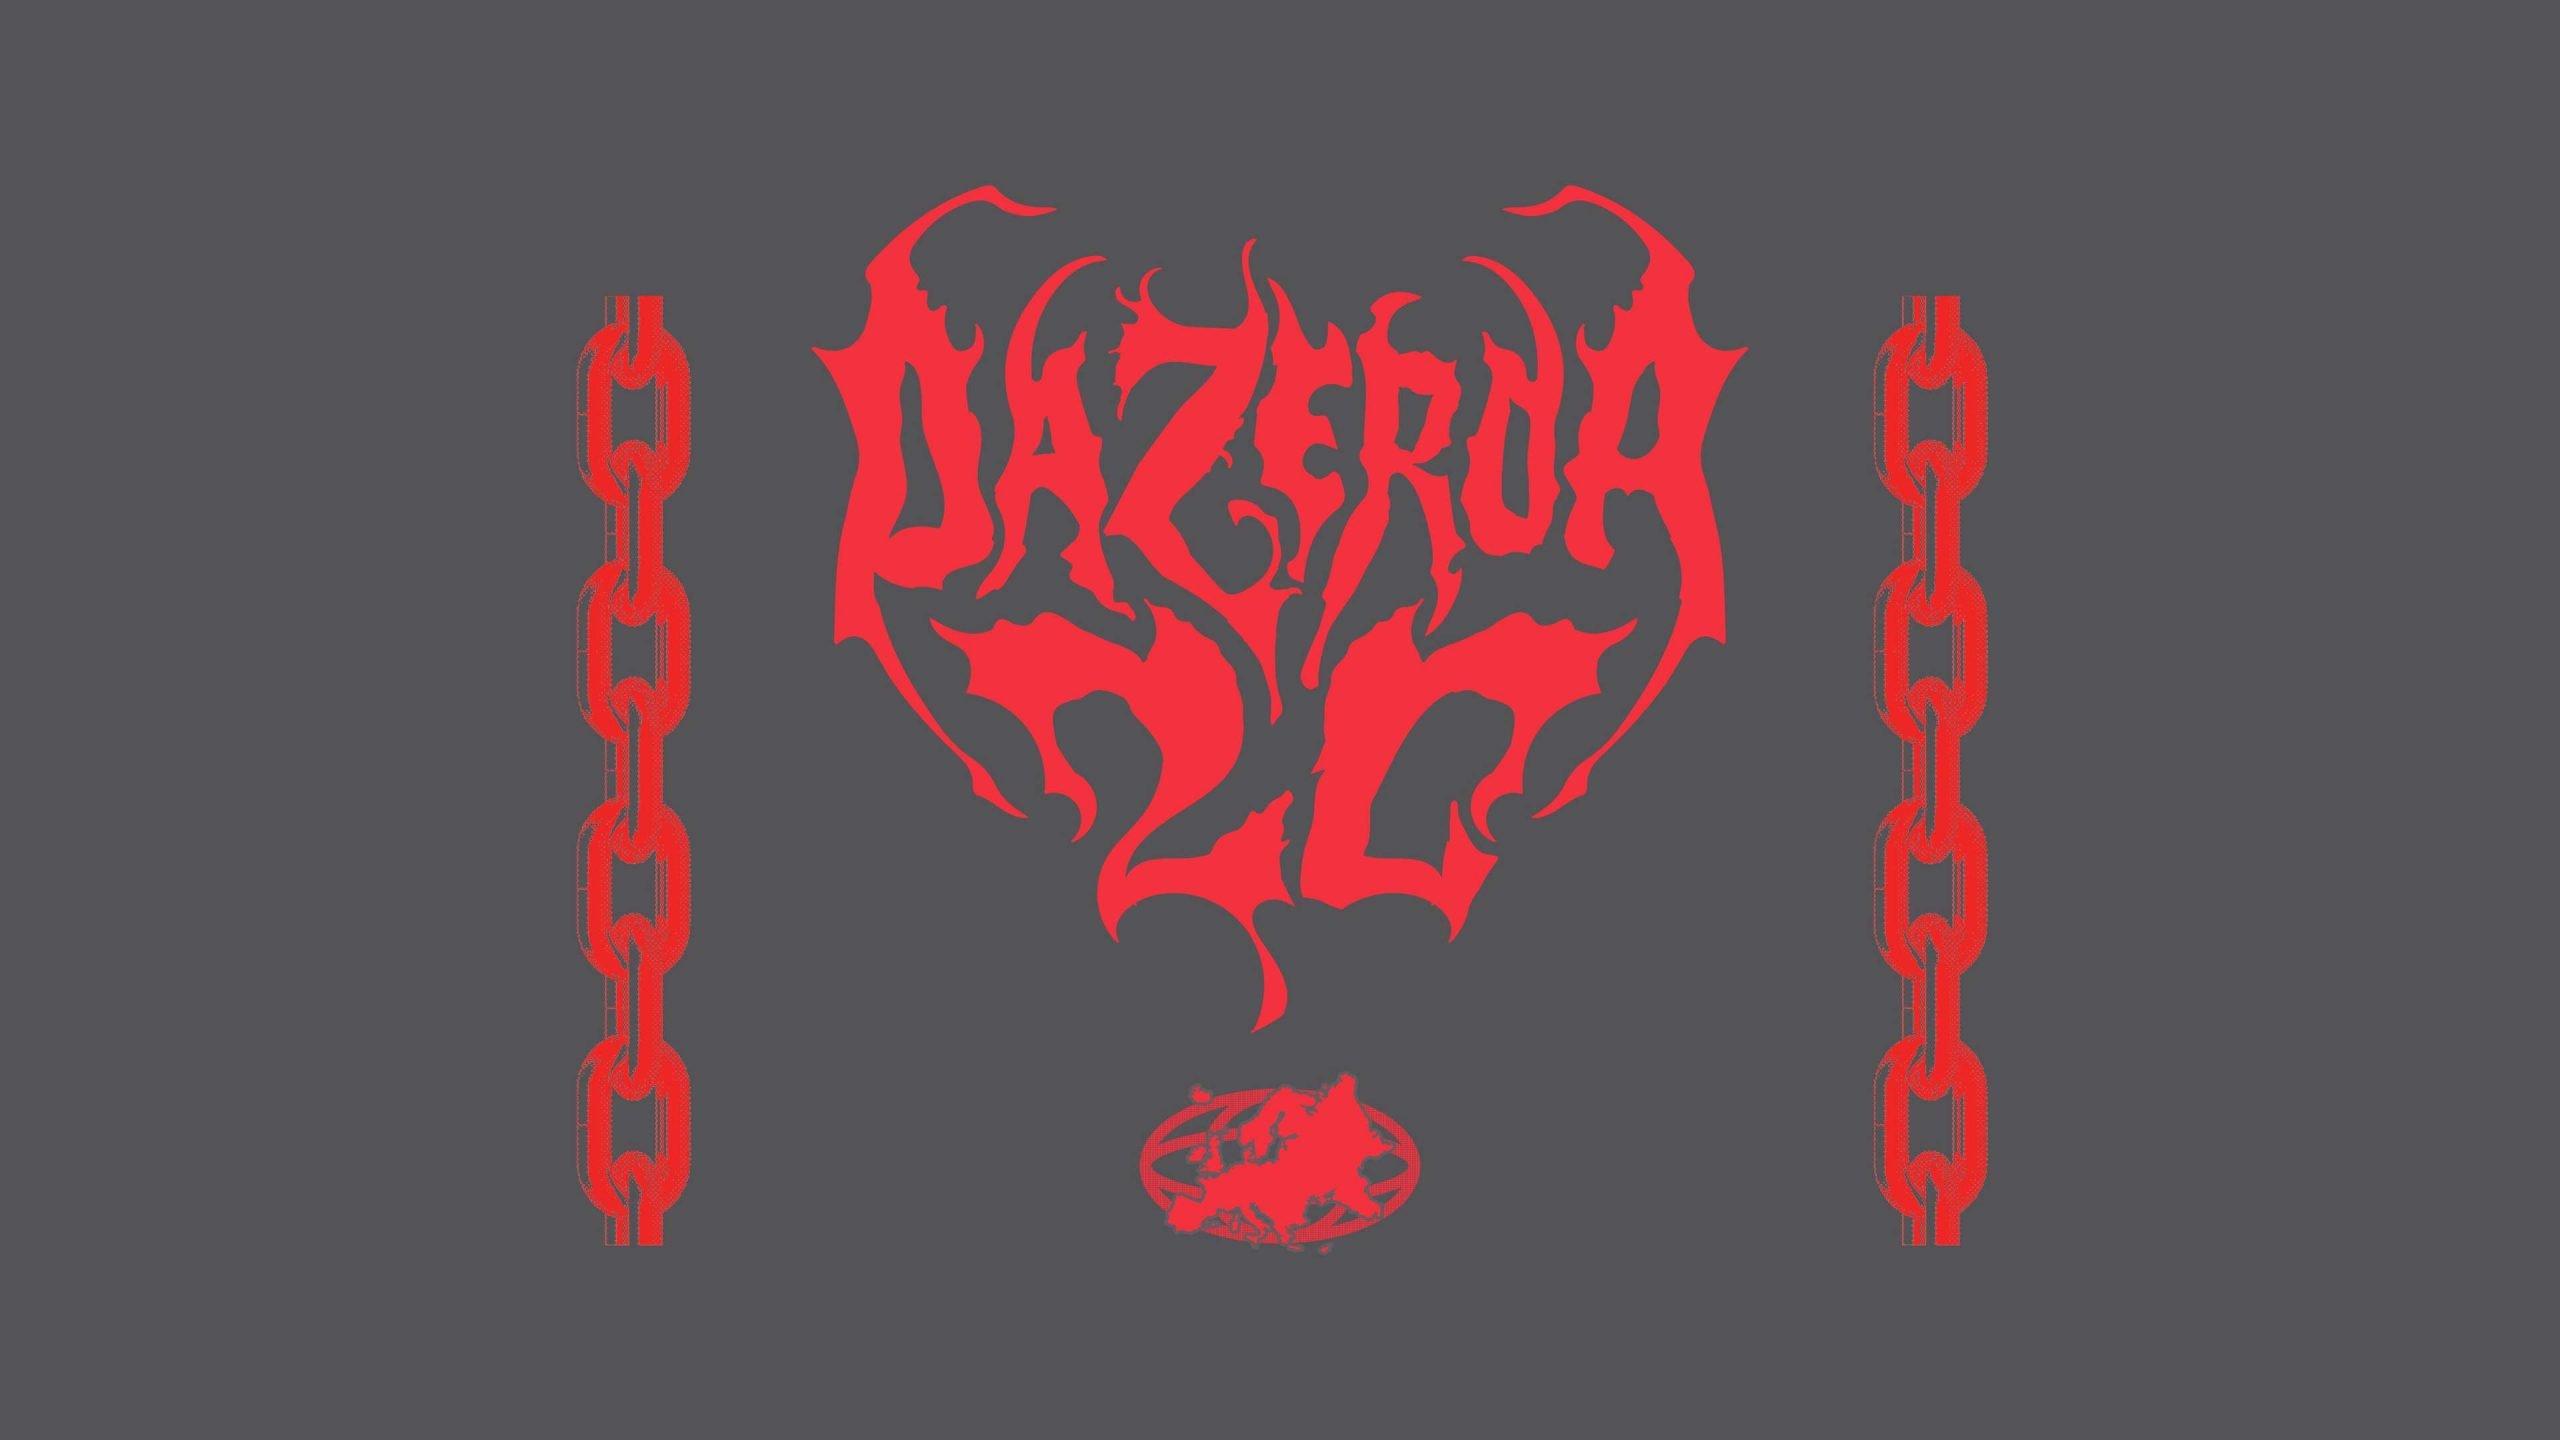 CAPO-PLAZA-TOUR-MERCH-Product-04-Graphics-02